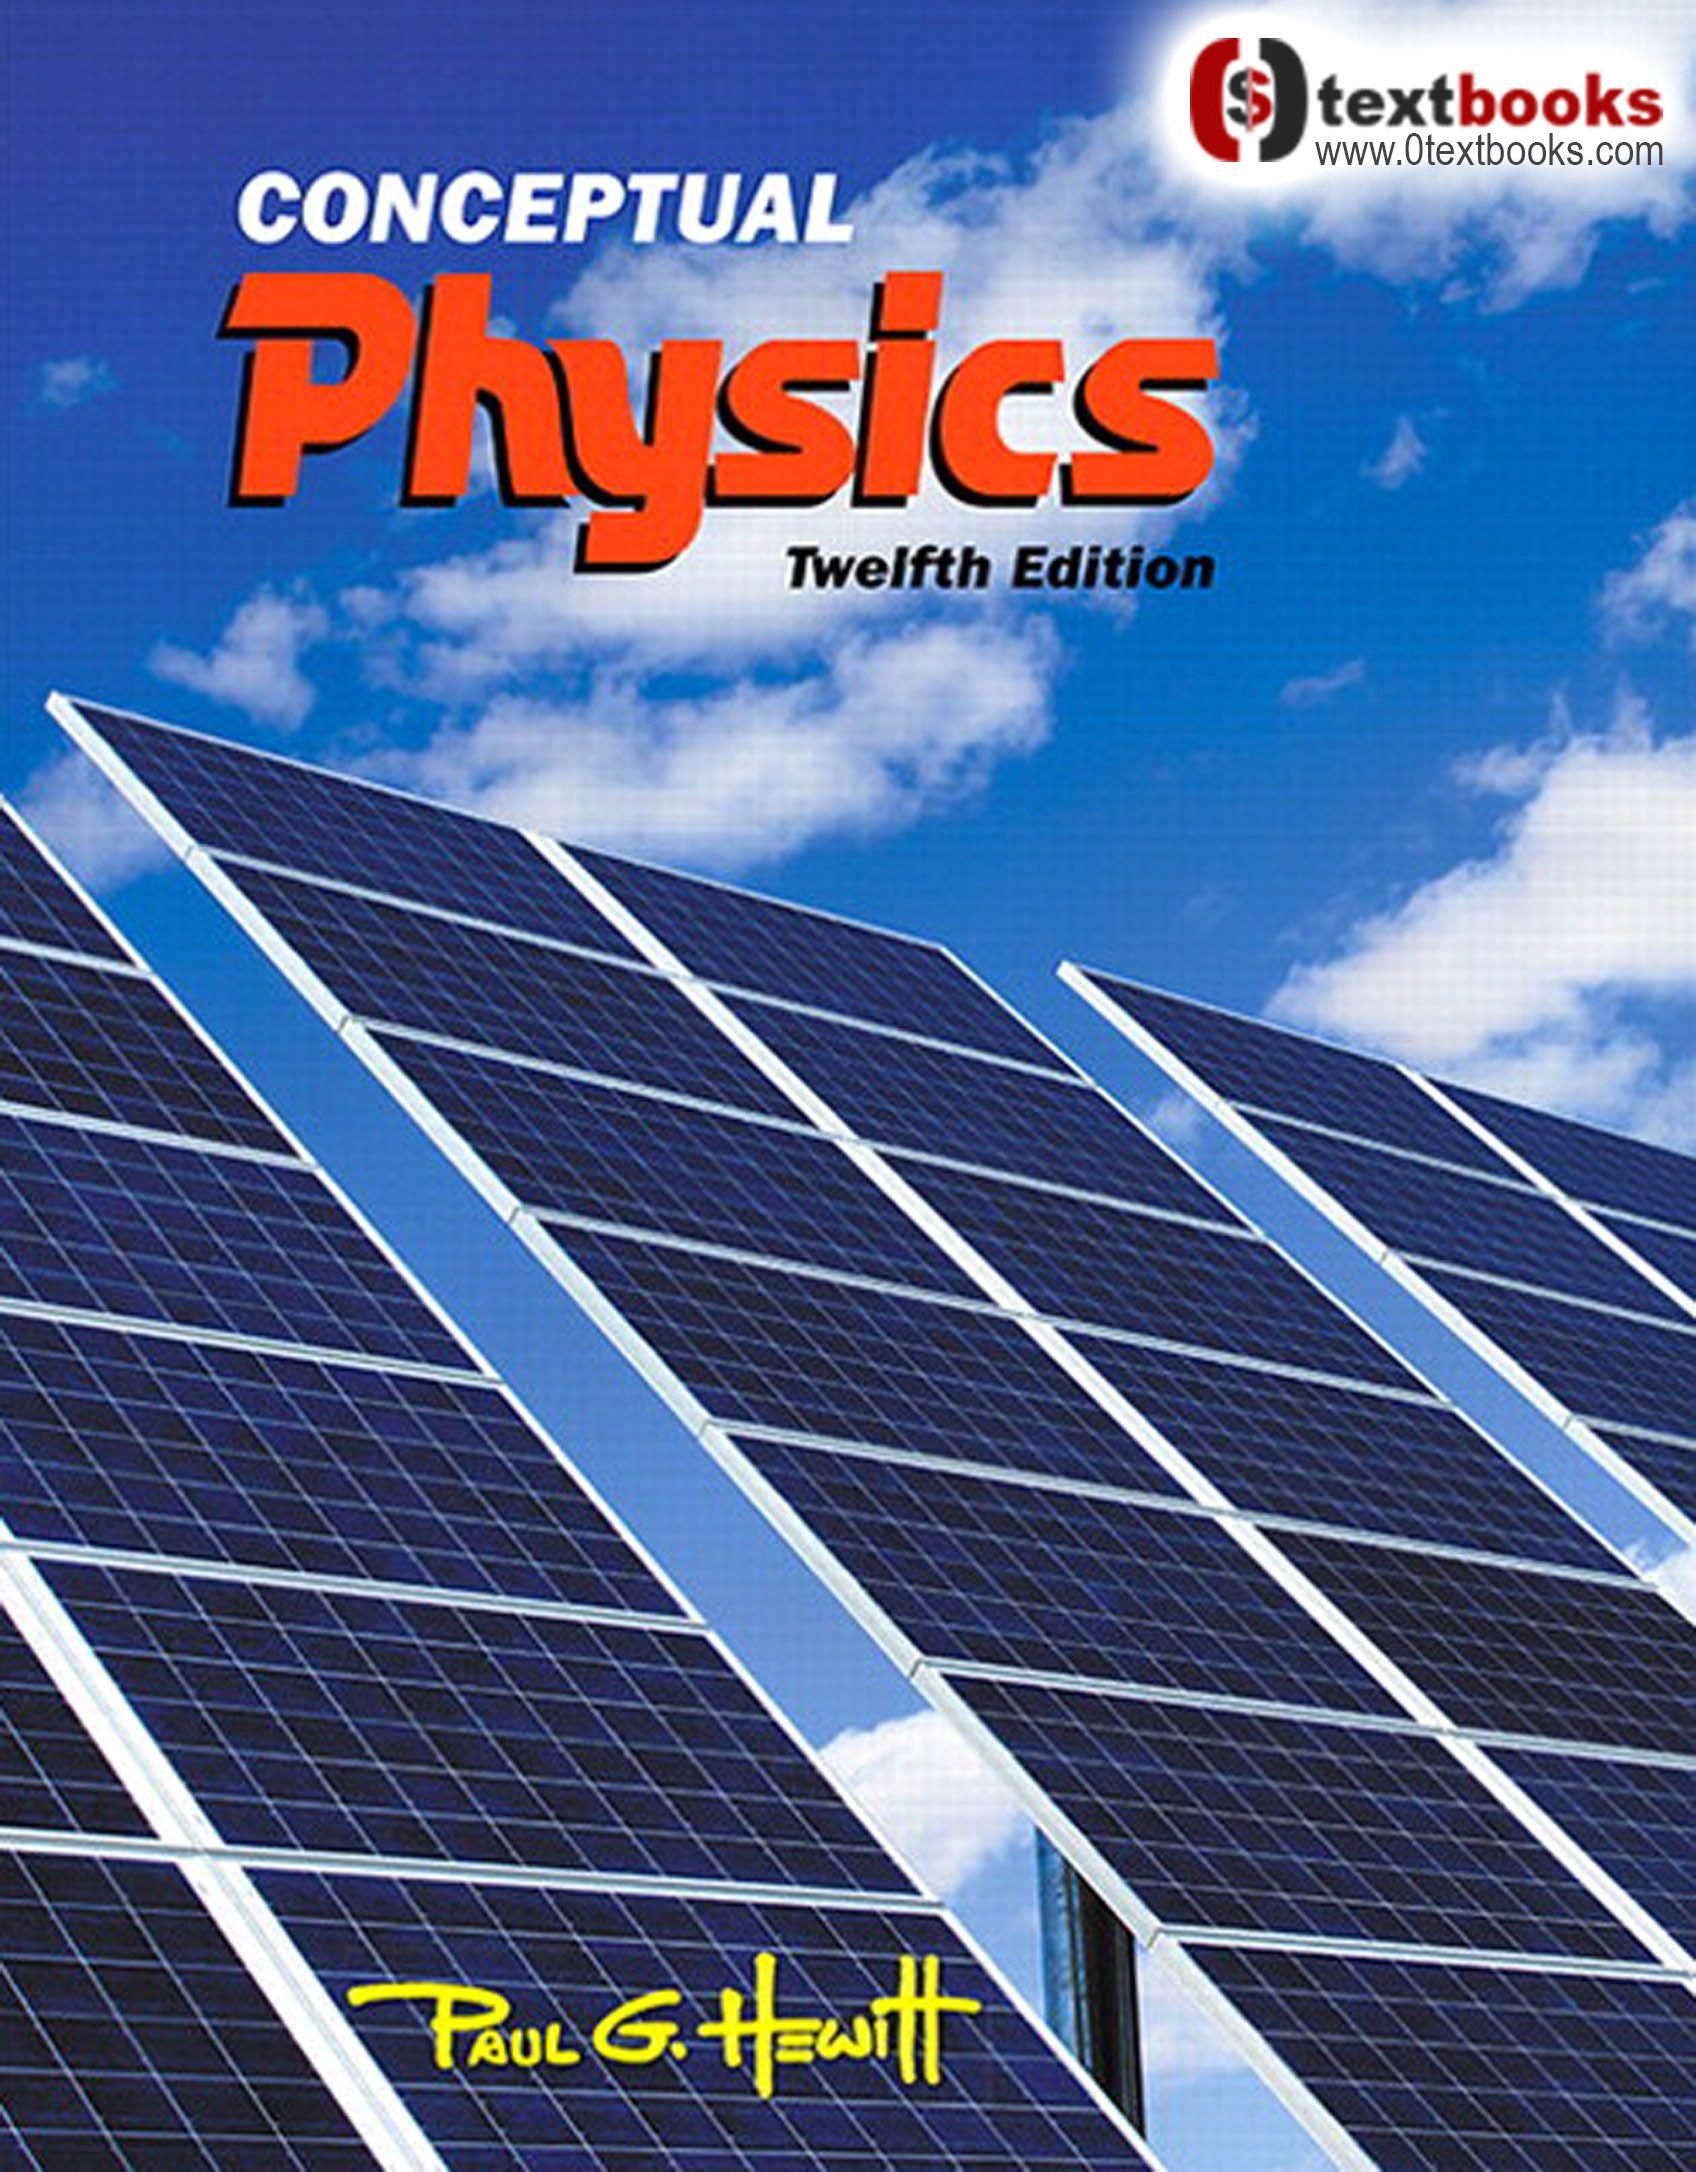 Conceptual Physics 12th Edition